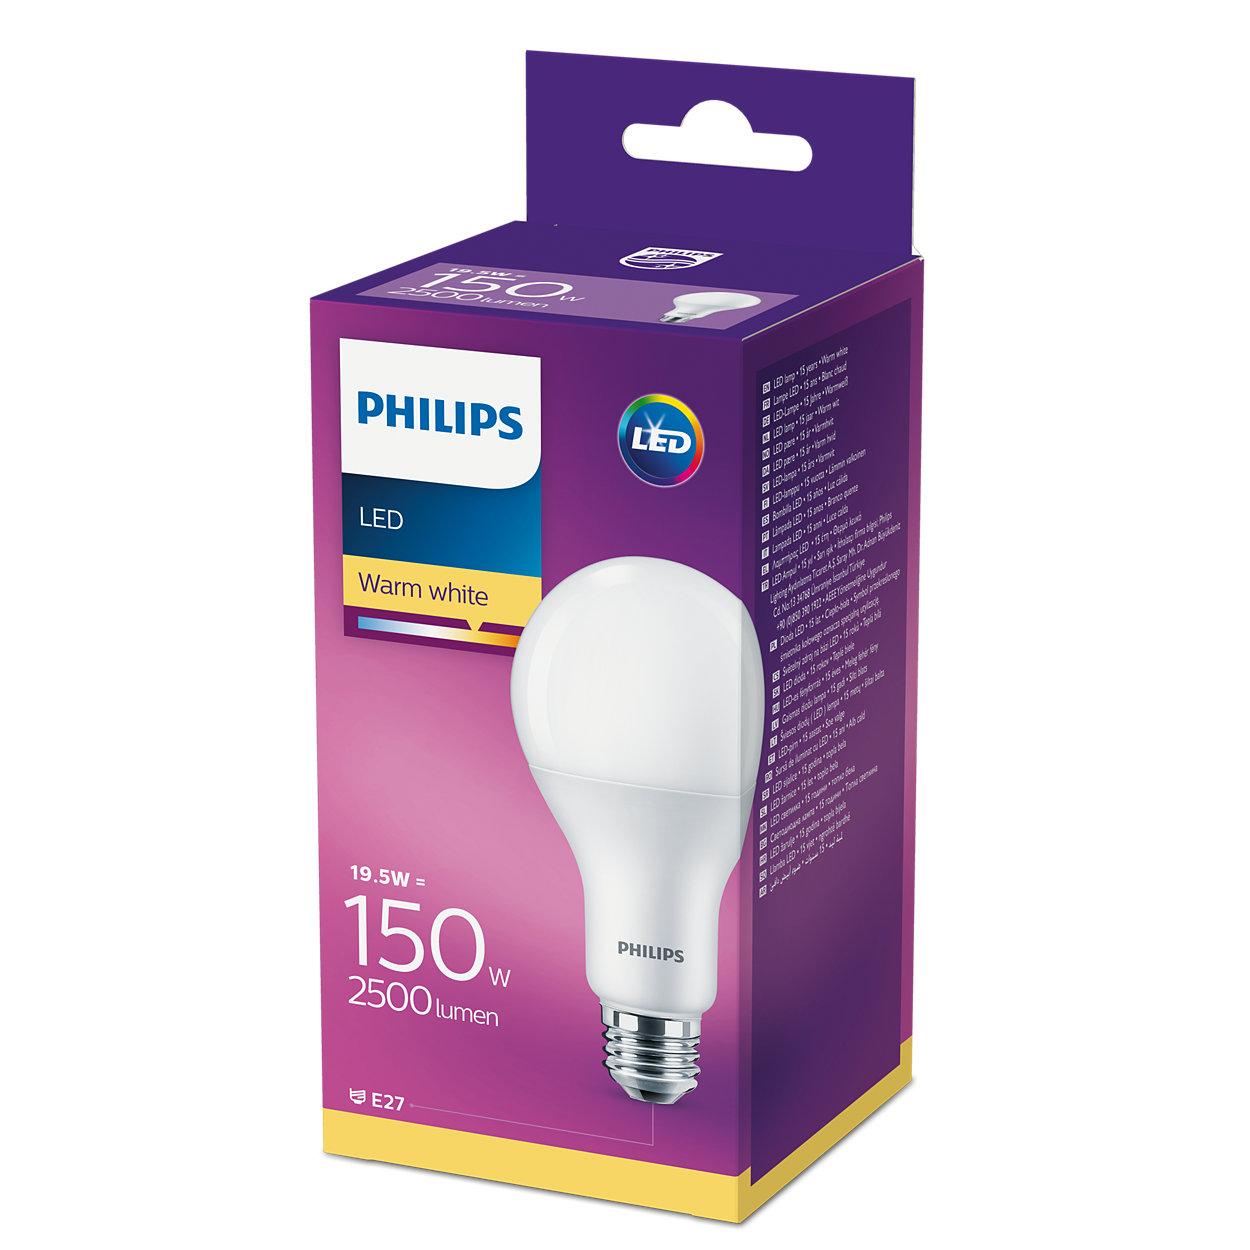 Philips, LED Leuchtmittel 8718696813799 19,5W (150W), E27, warmweiß, 2500Lumen